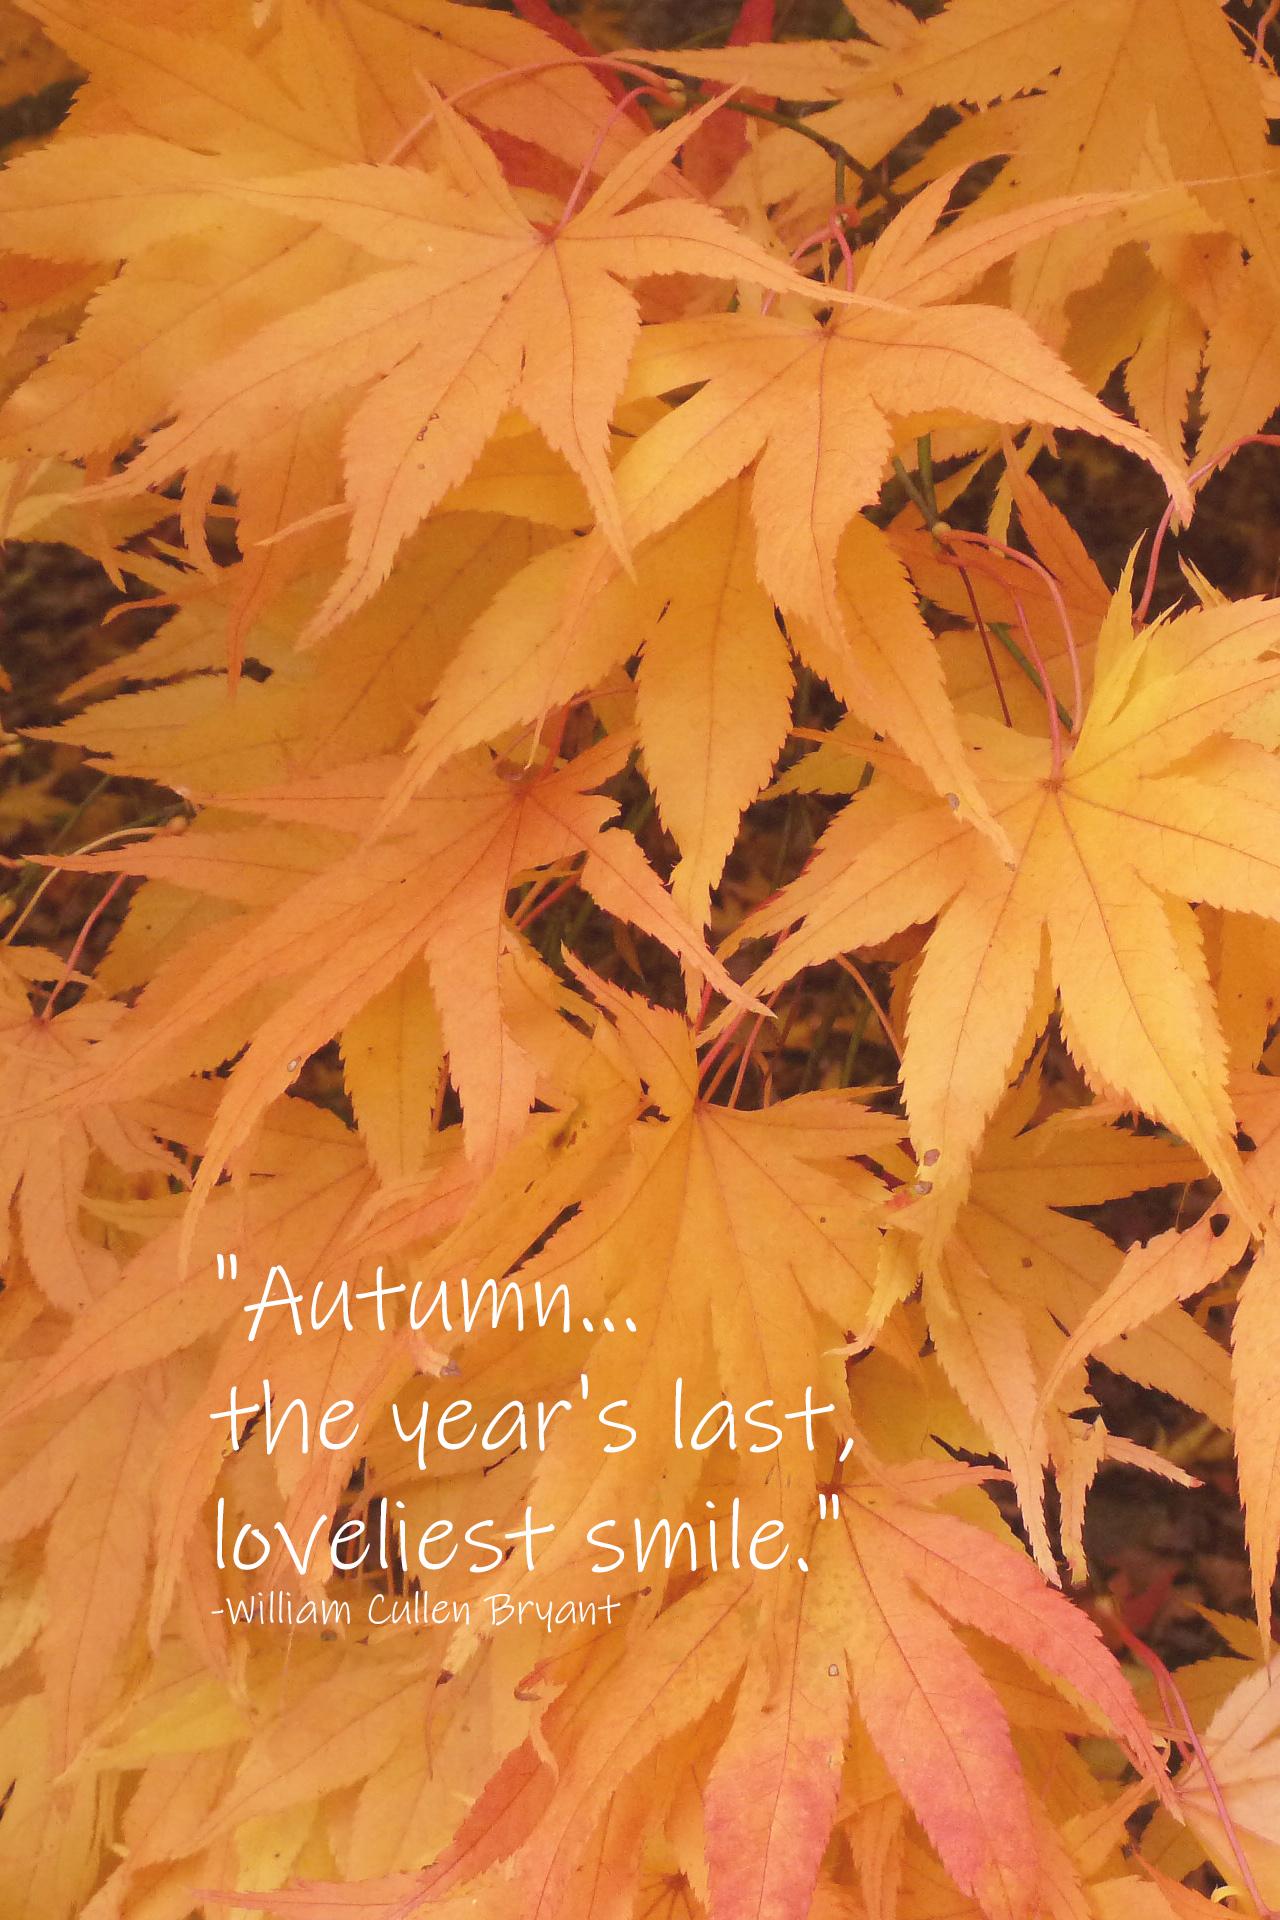 Autumn Loveliest Smile William Cullen Bryant Quote